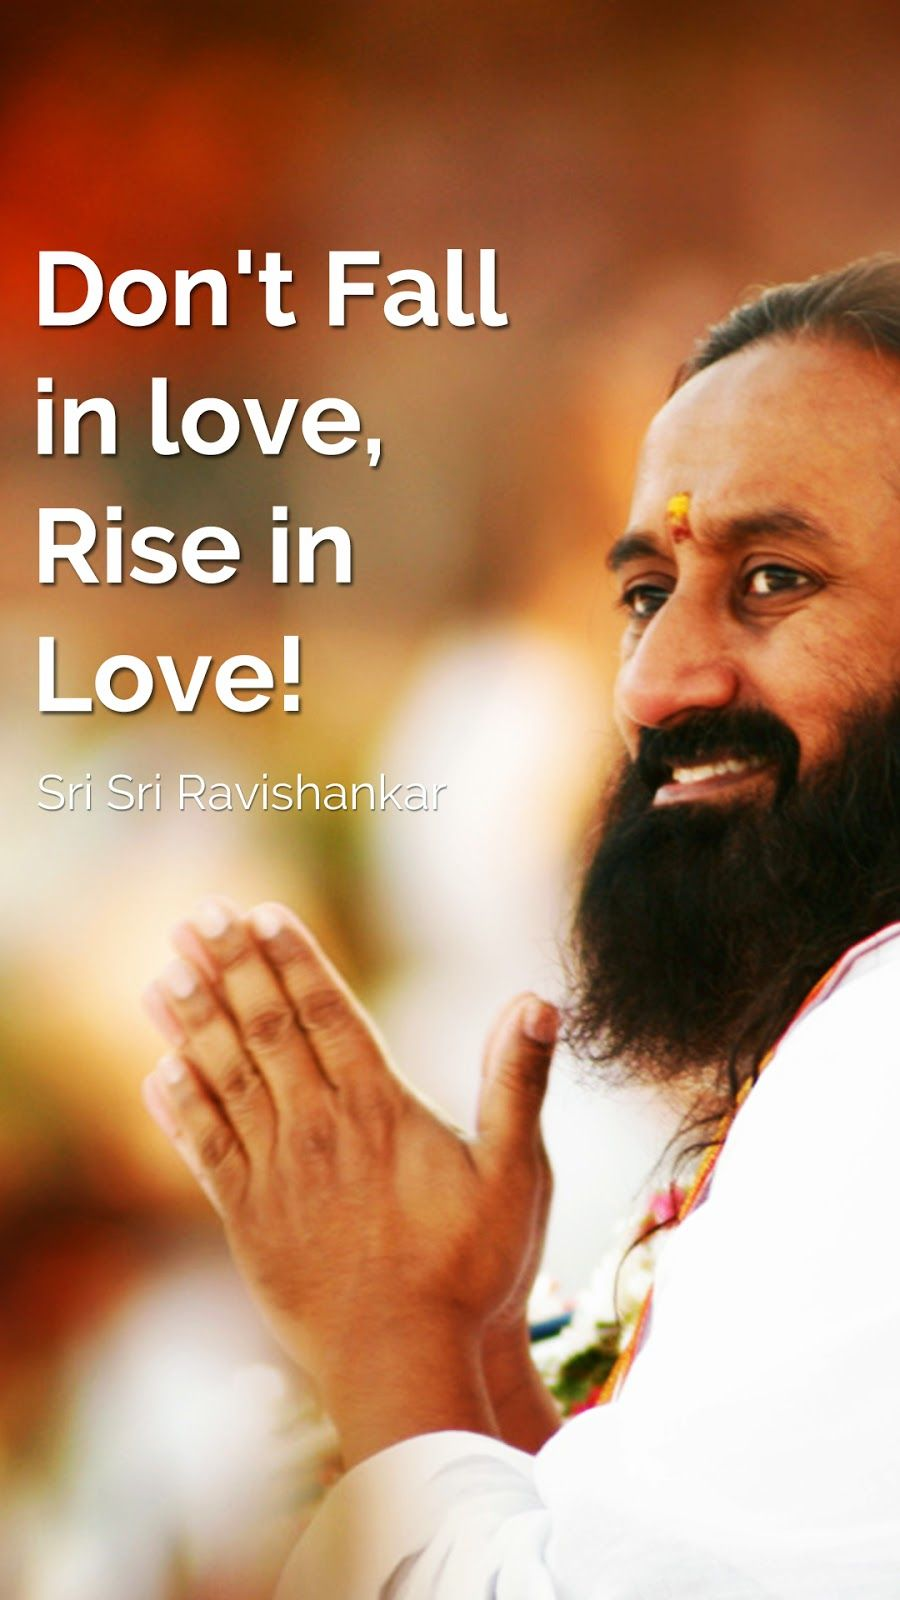 6 Hd Mobile Wallpapers Of Sri Sri Ravishankar Guruji Quotes